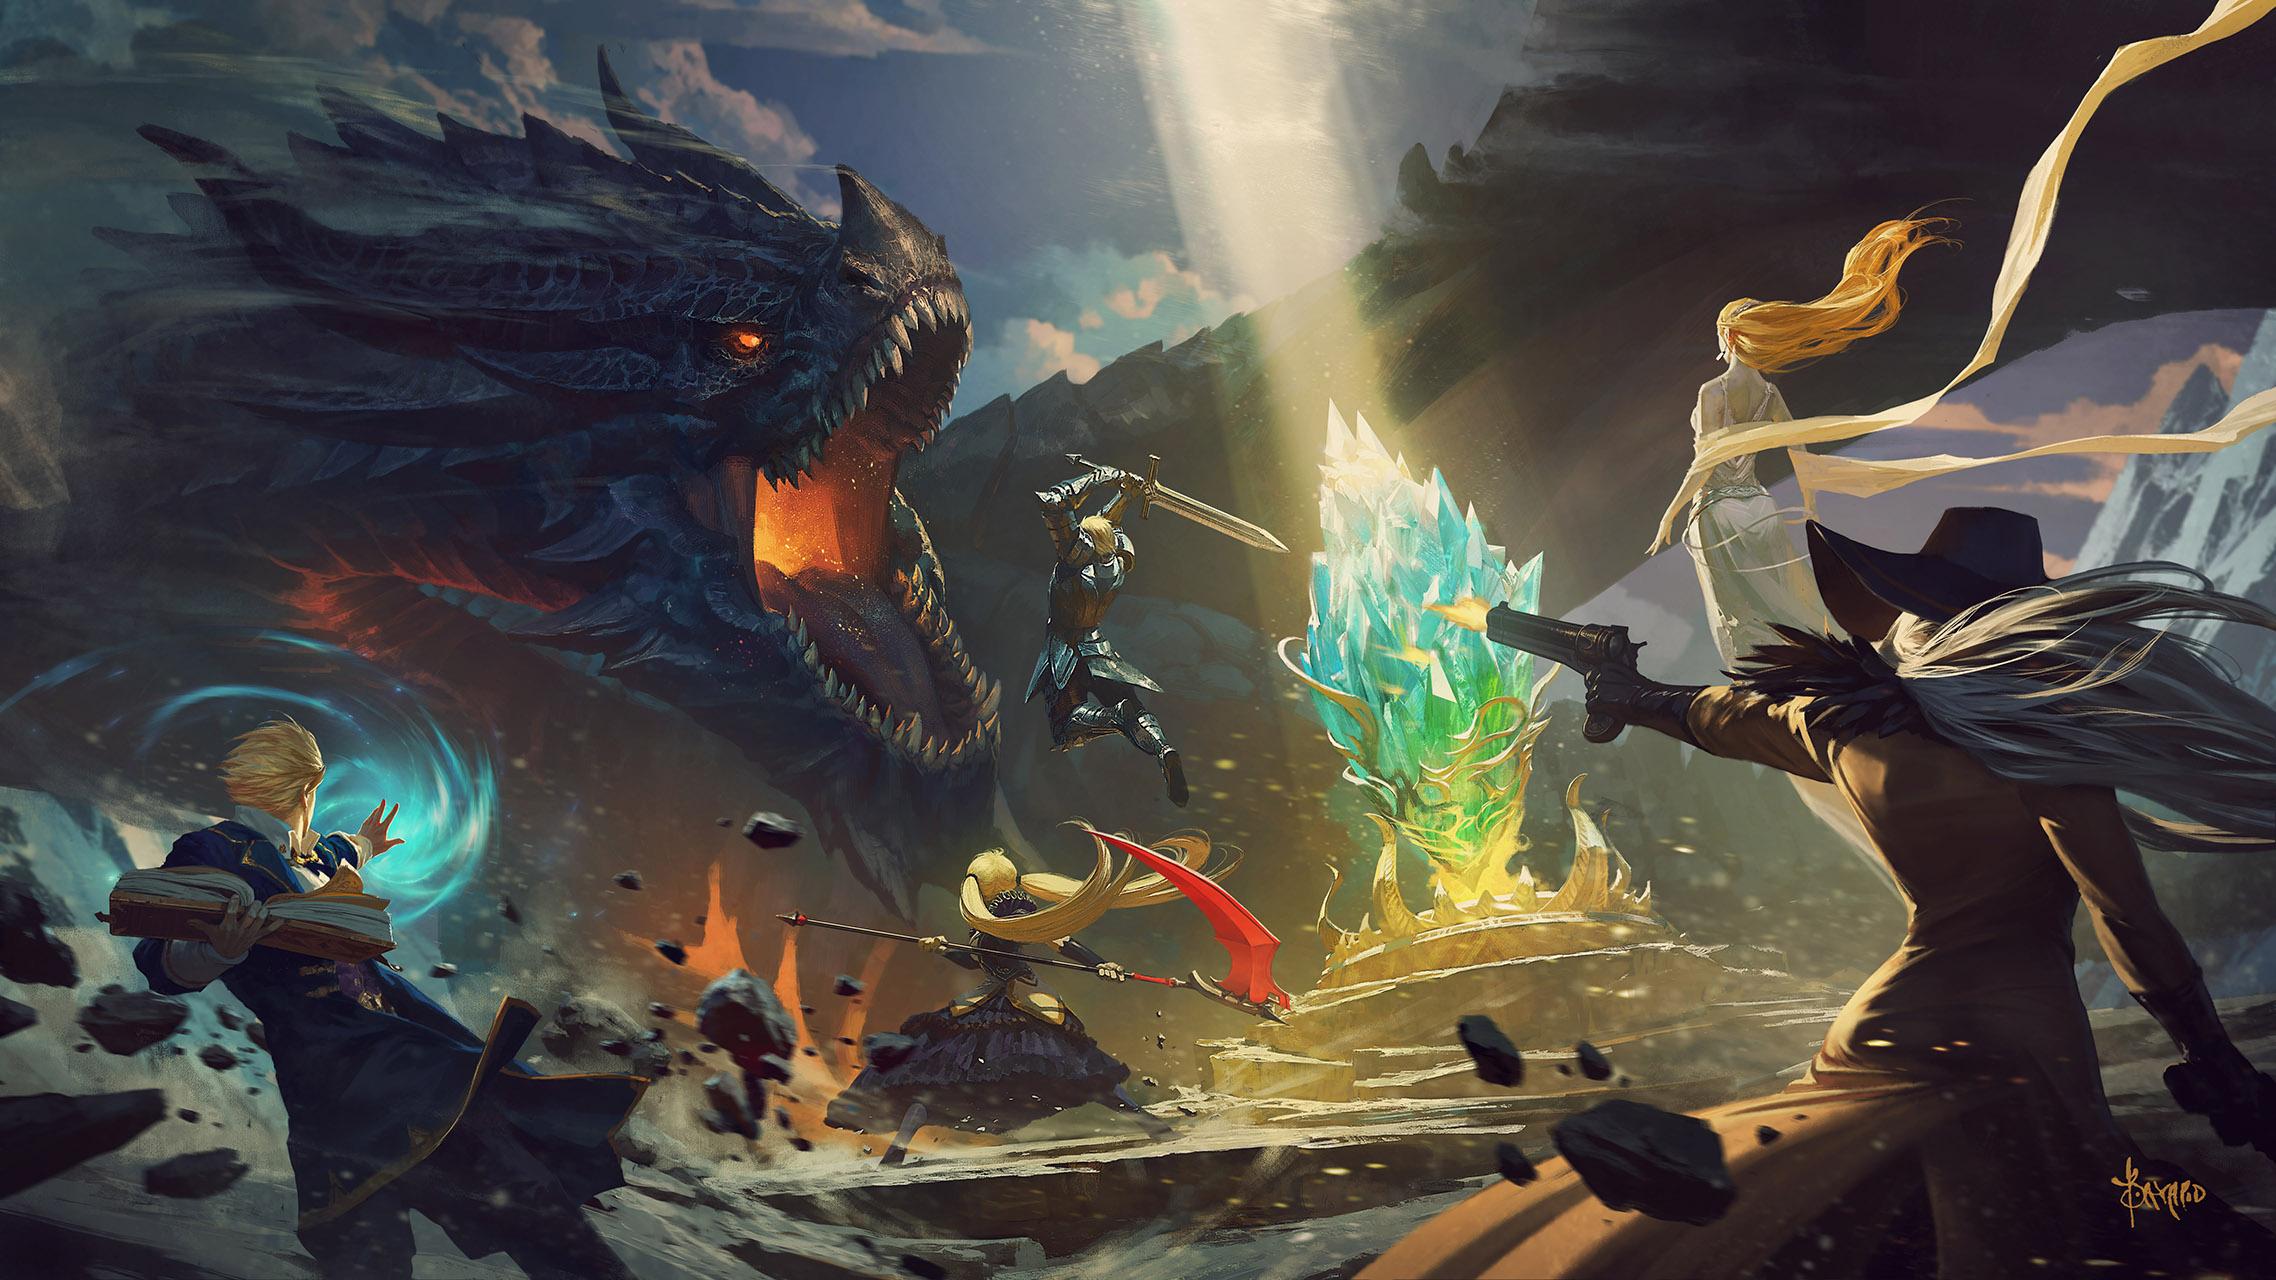 Cover art for Daybreak Legends by bayardwu